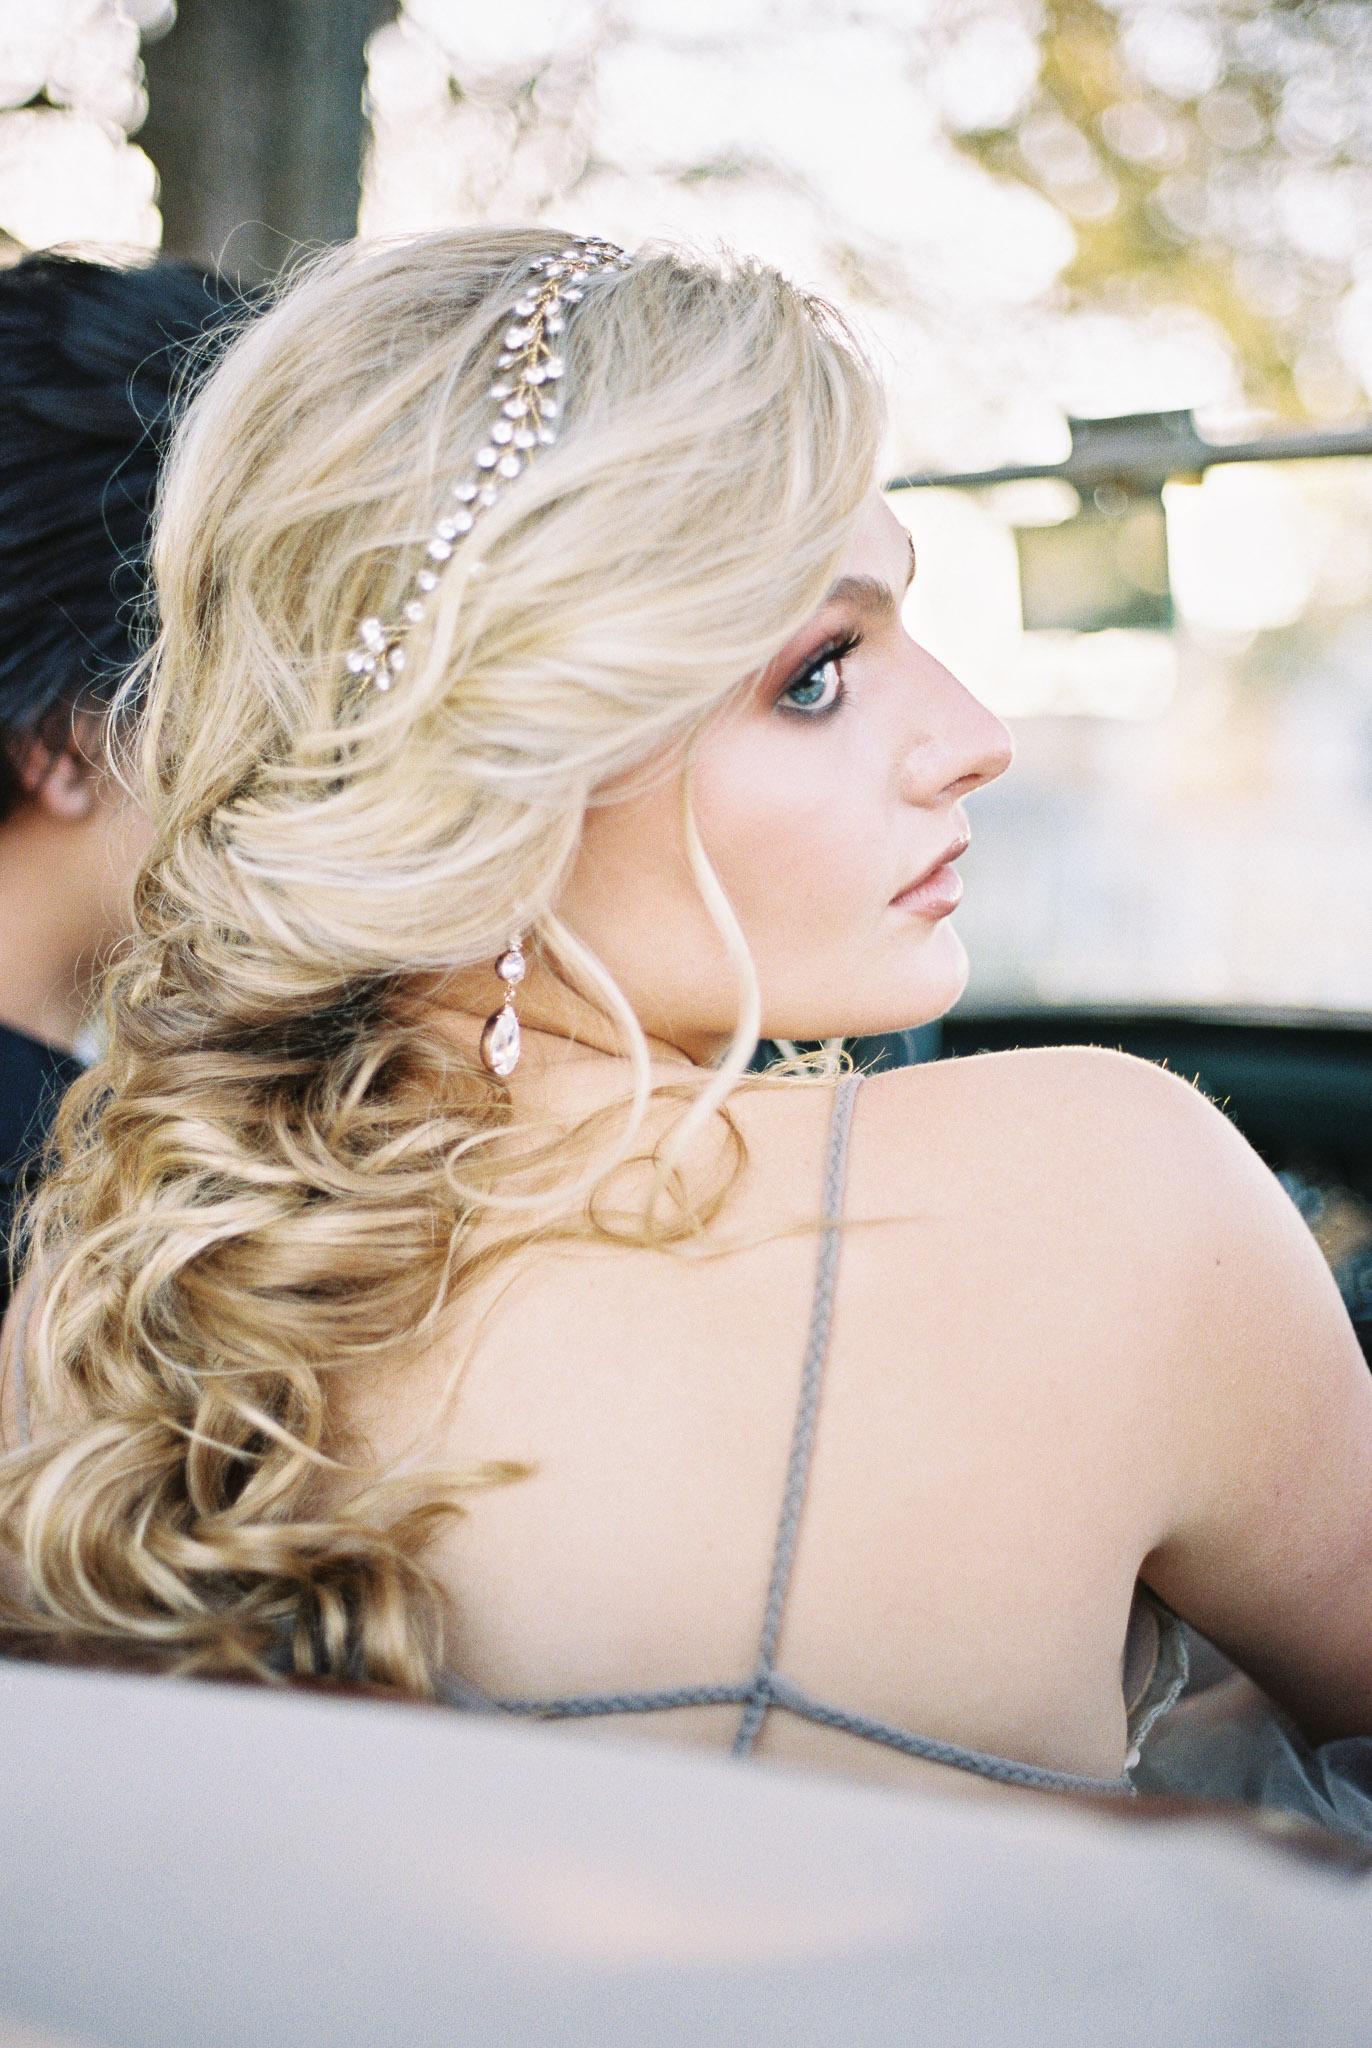 lindsay-marie-design-hair-vine-earrings